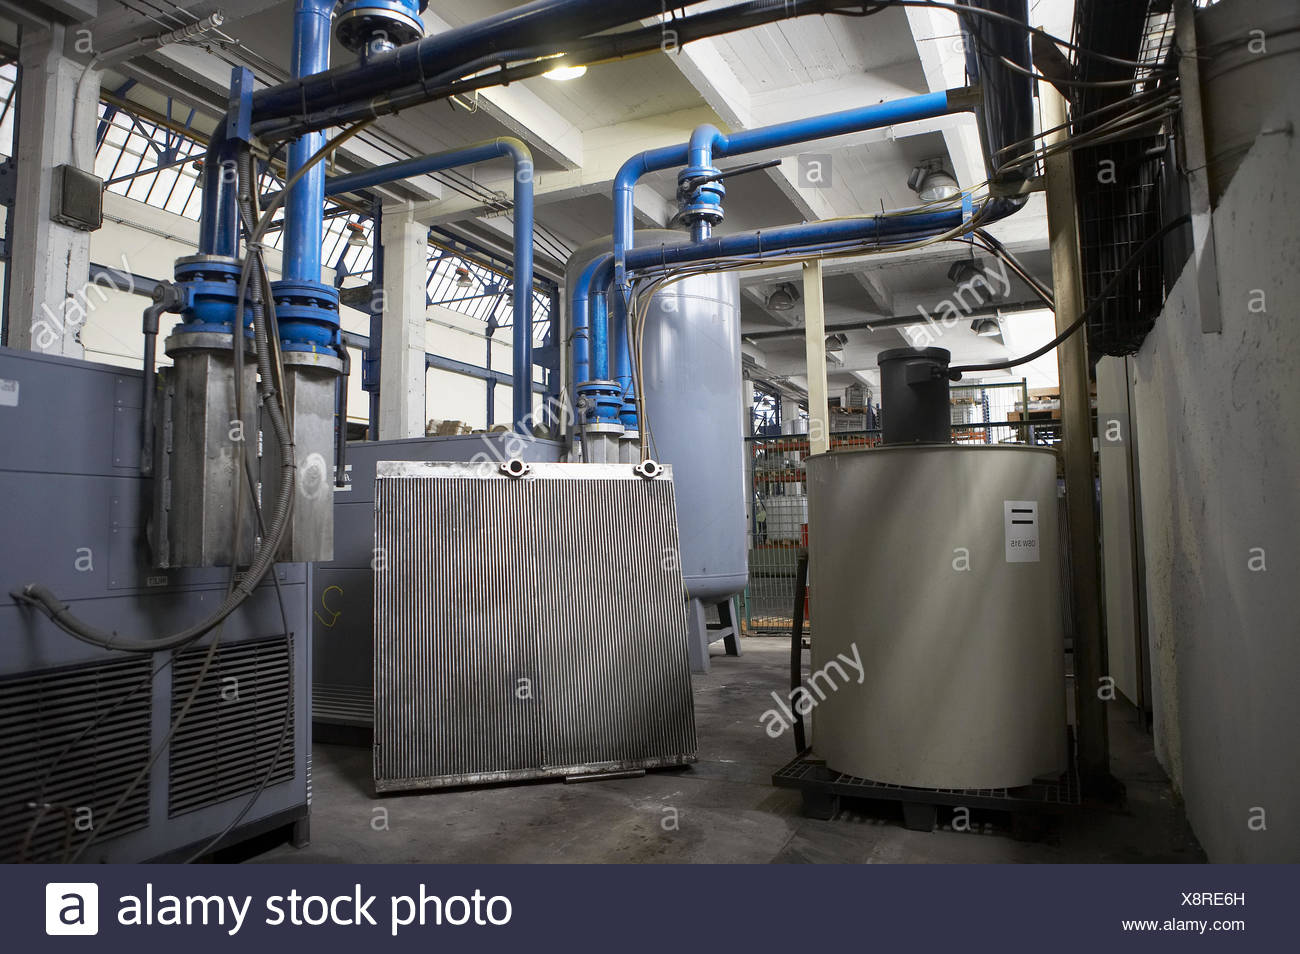 Air compressed, radiator, metallurgy. Guipuzcoa, Euskadi, Spain - Stock Image